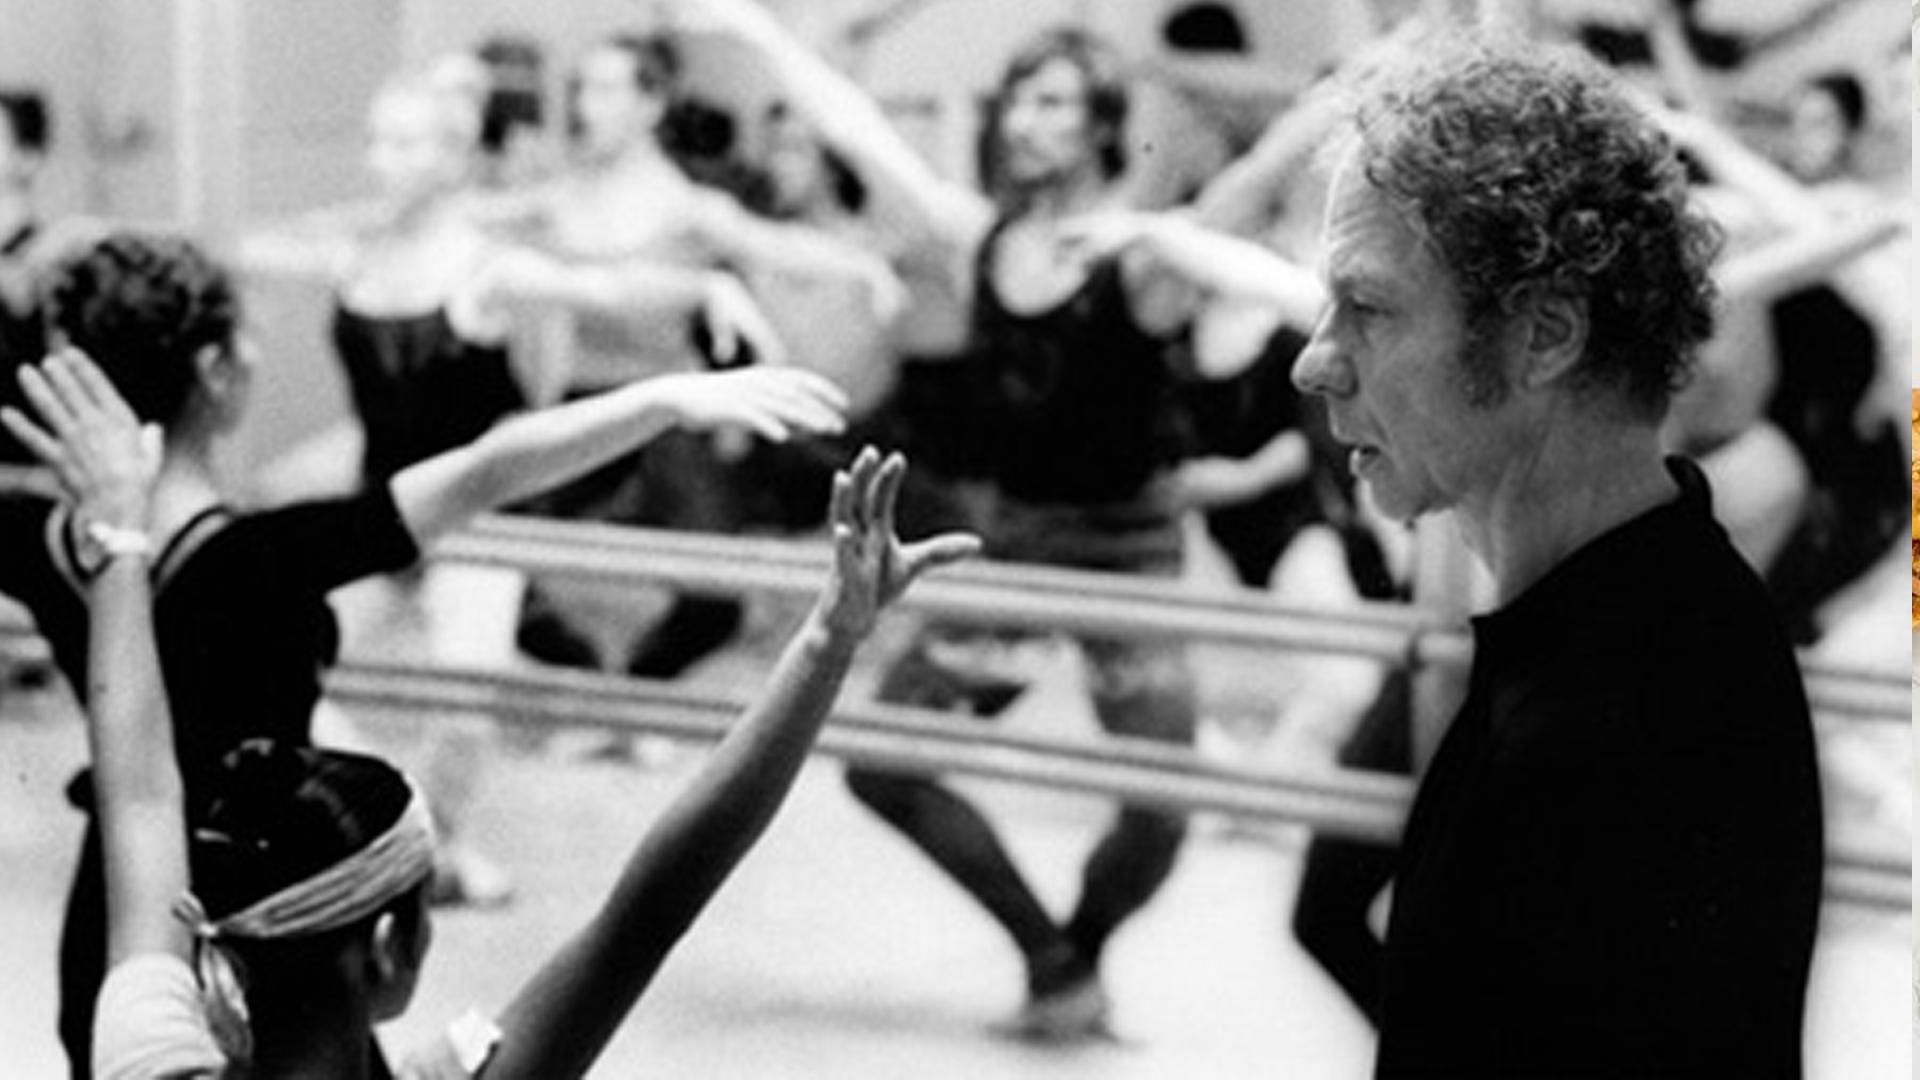 Archival image of Merce Cunningham teaching a dance class